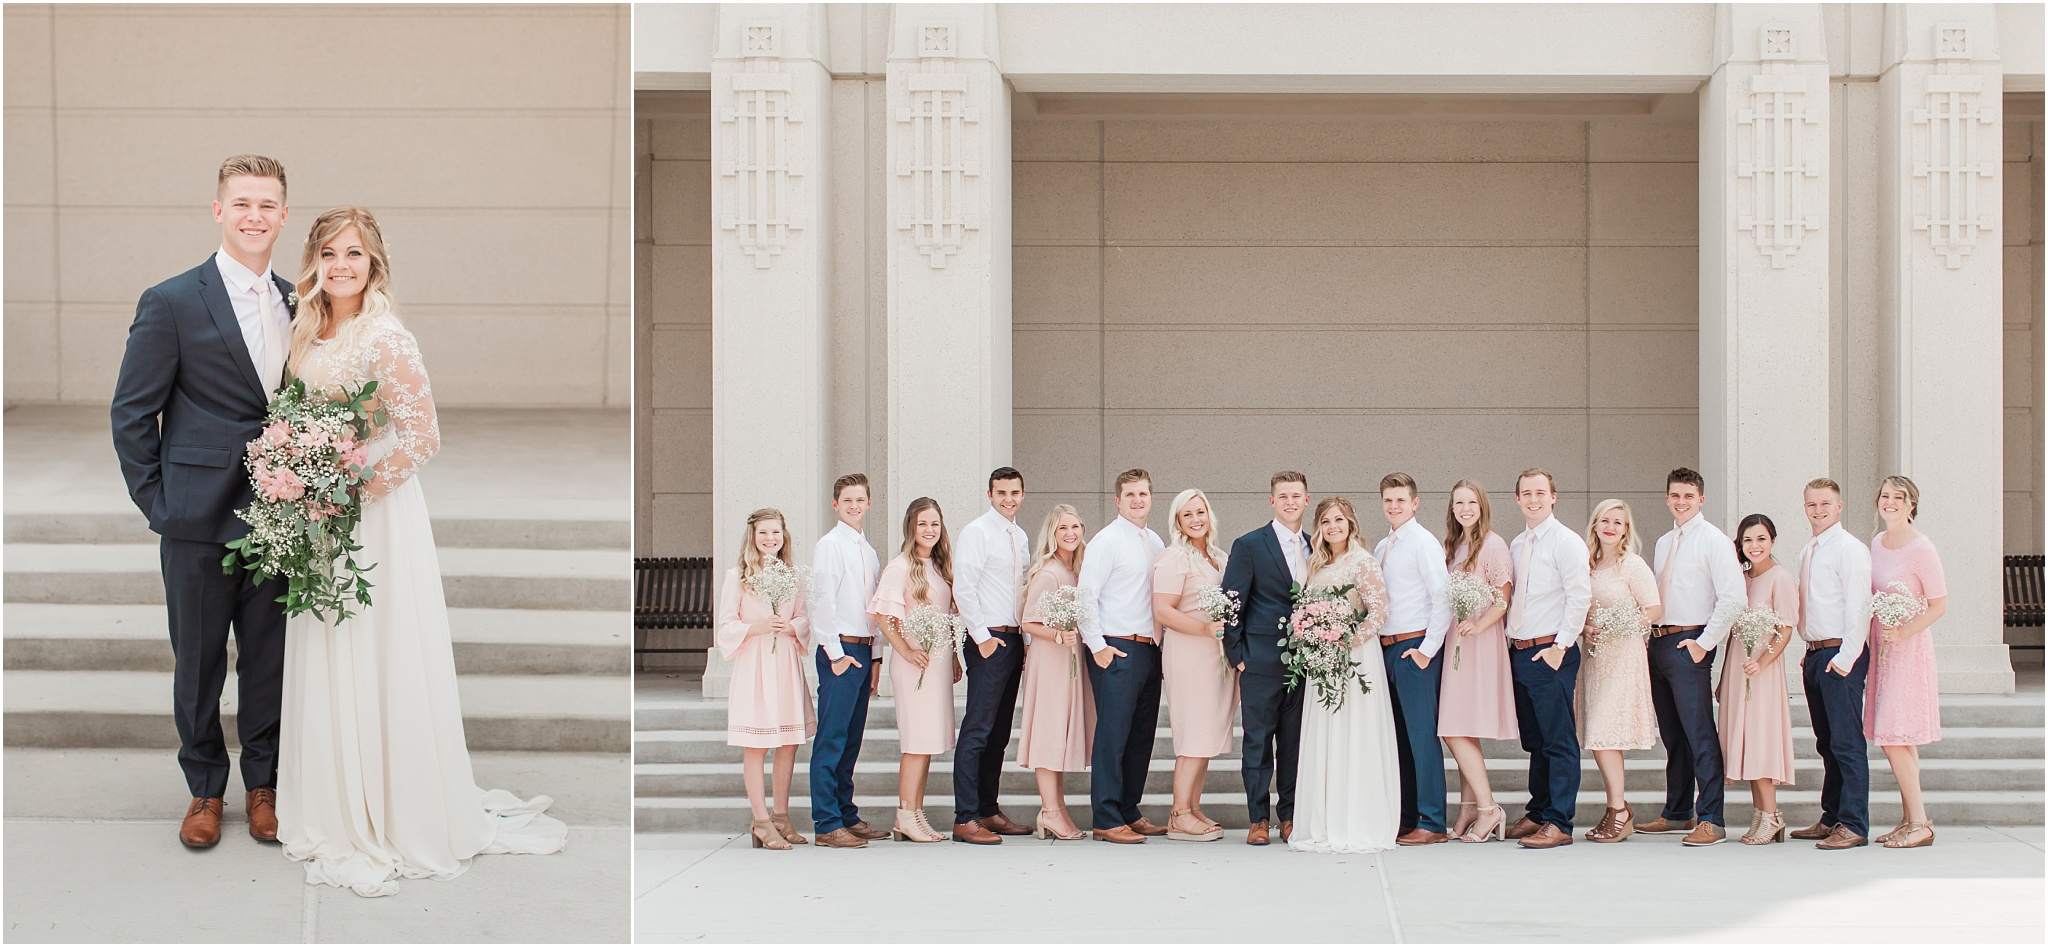 Wedding Photography_Meridian Idaho Temple_Boise Idaho_Nampa Idaho_Leah Southwick Photography_0034.jpg